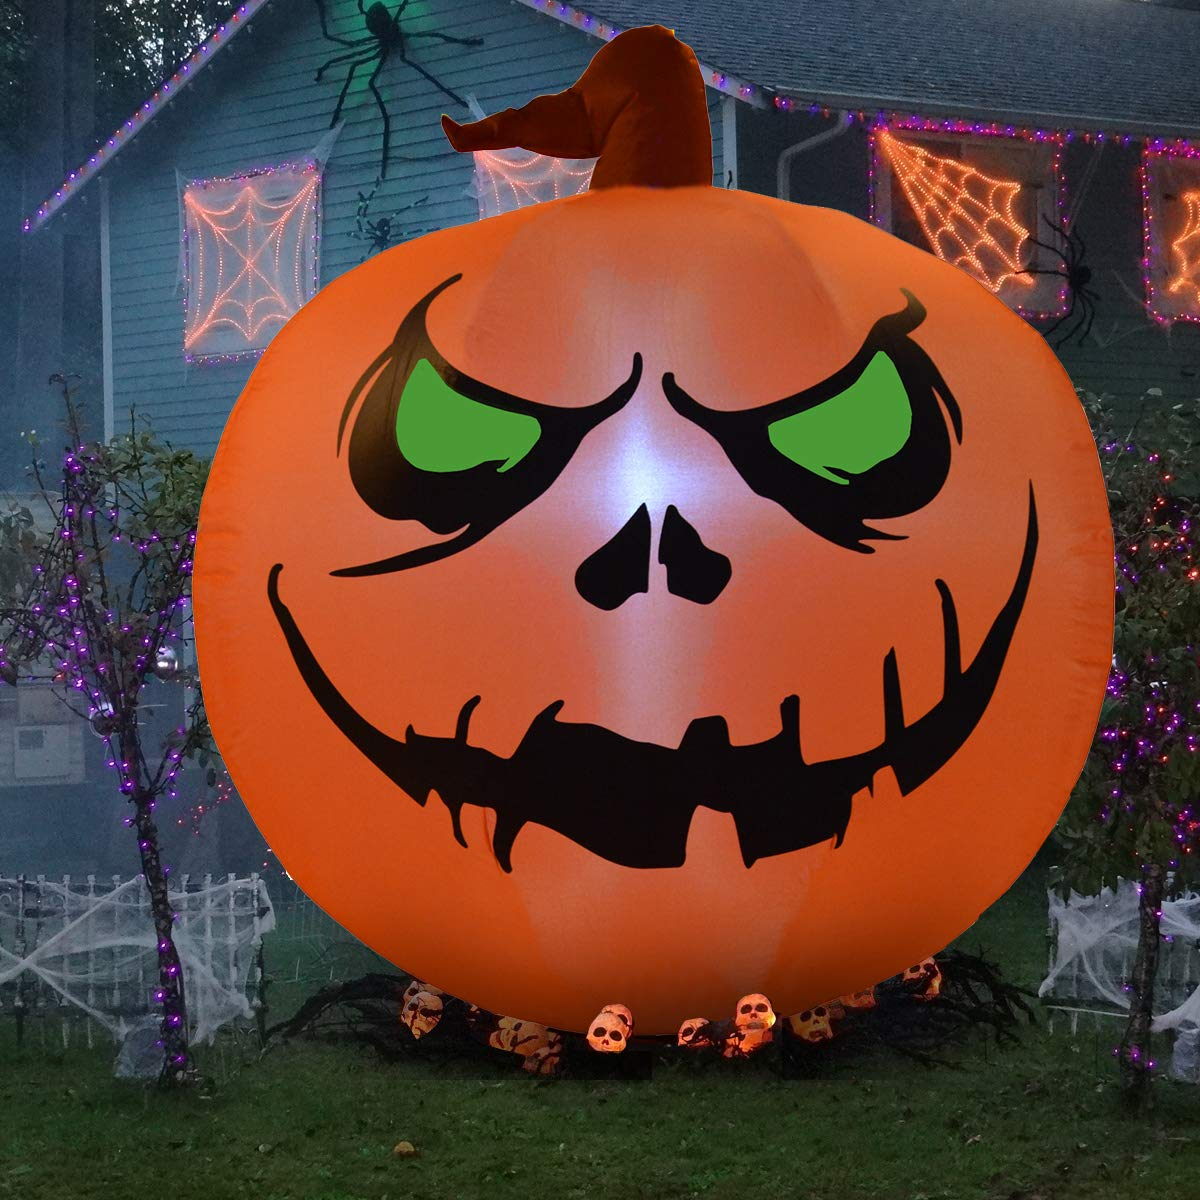 NewAim 4 Foot Halloween Inflatable Air Blown Pumpkin Lighted for Home Yard Garden Indoor and Outdoor Decoration